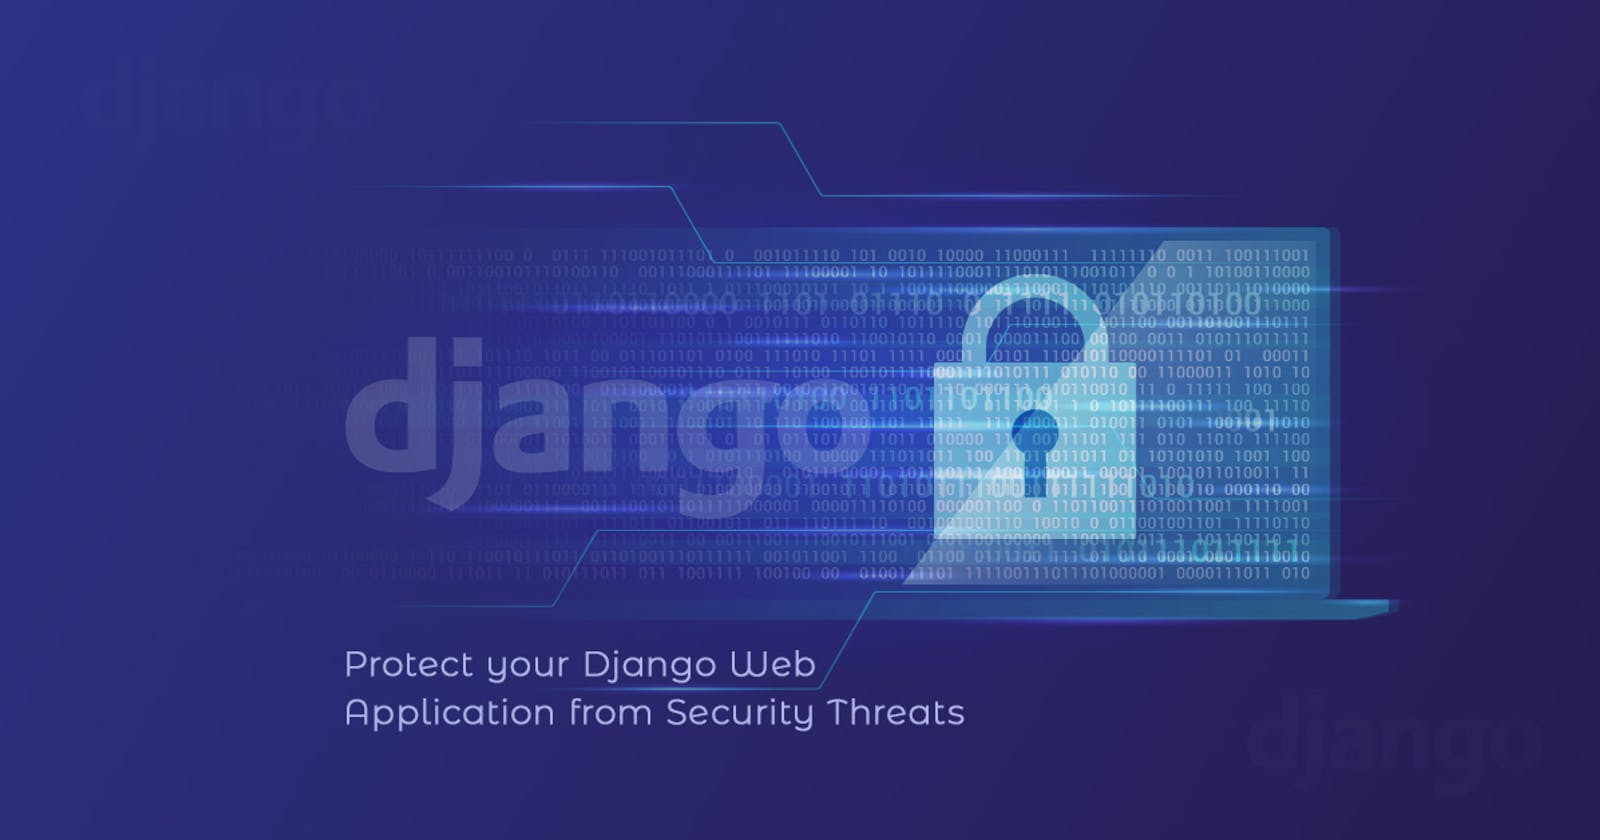 Deployment Web Security Checklist   Secure your Django App and Apache Server